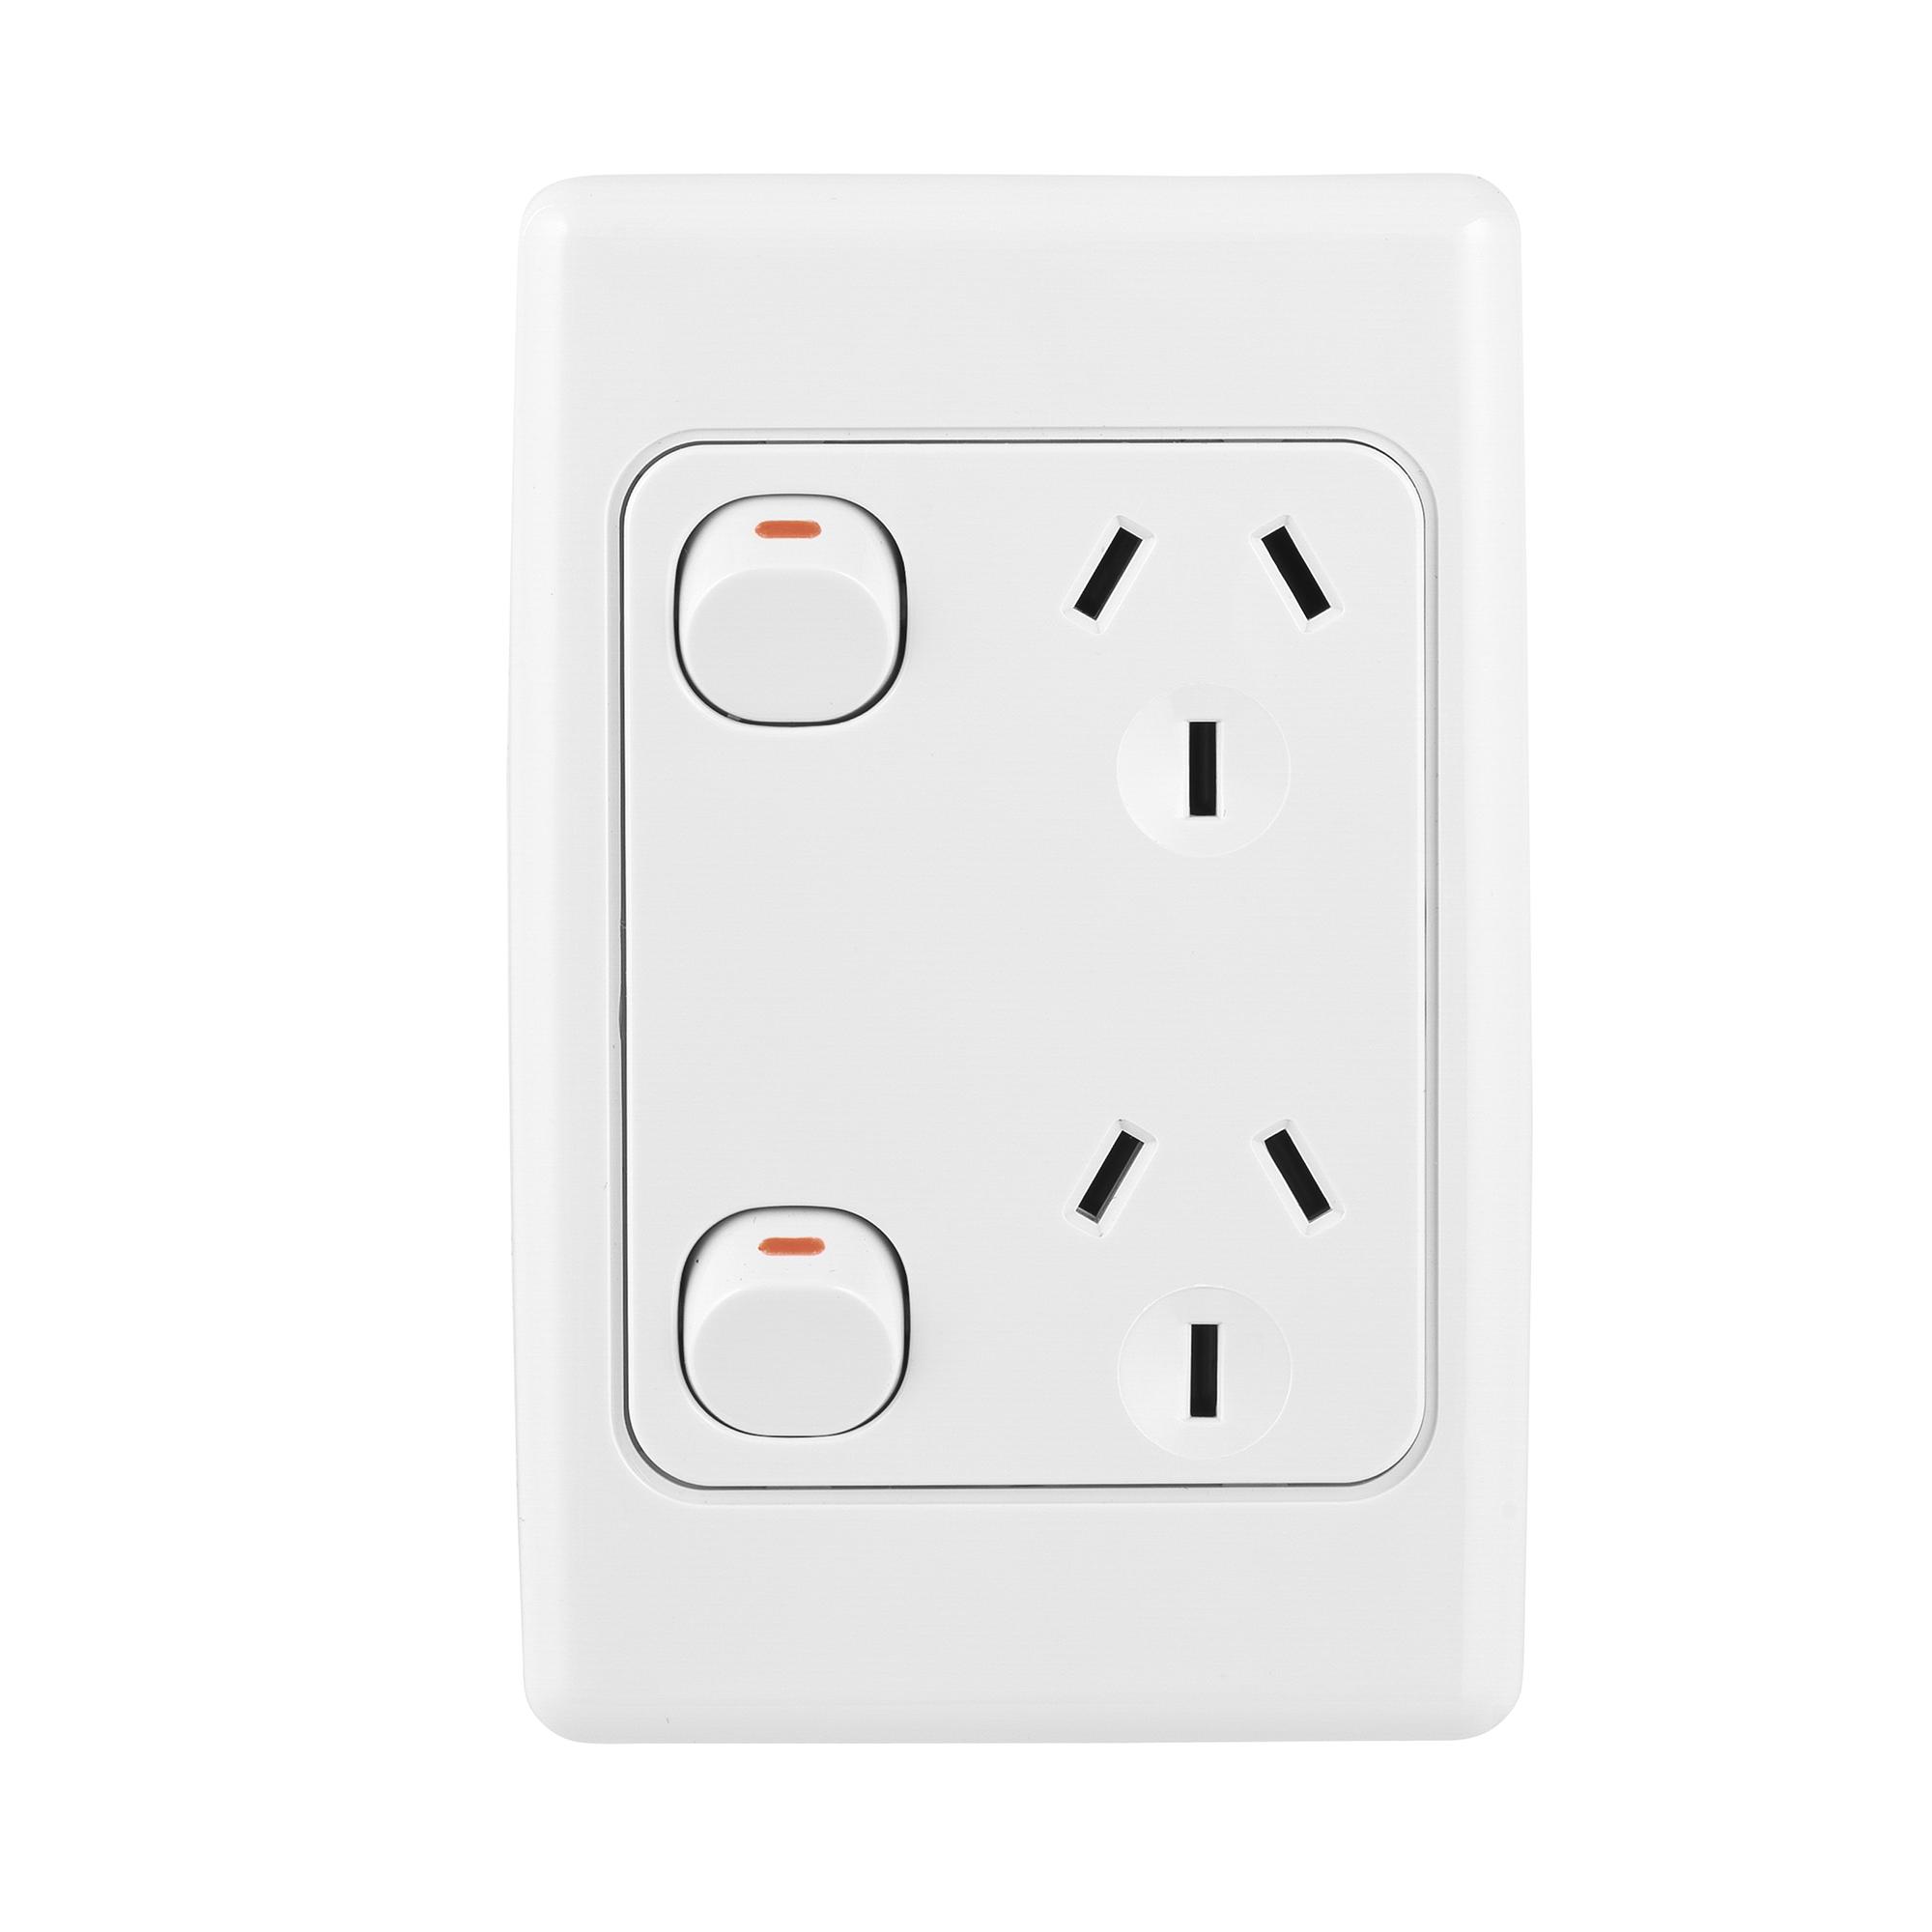 L vertical double power point